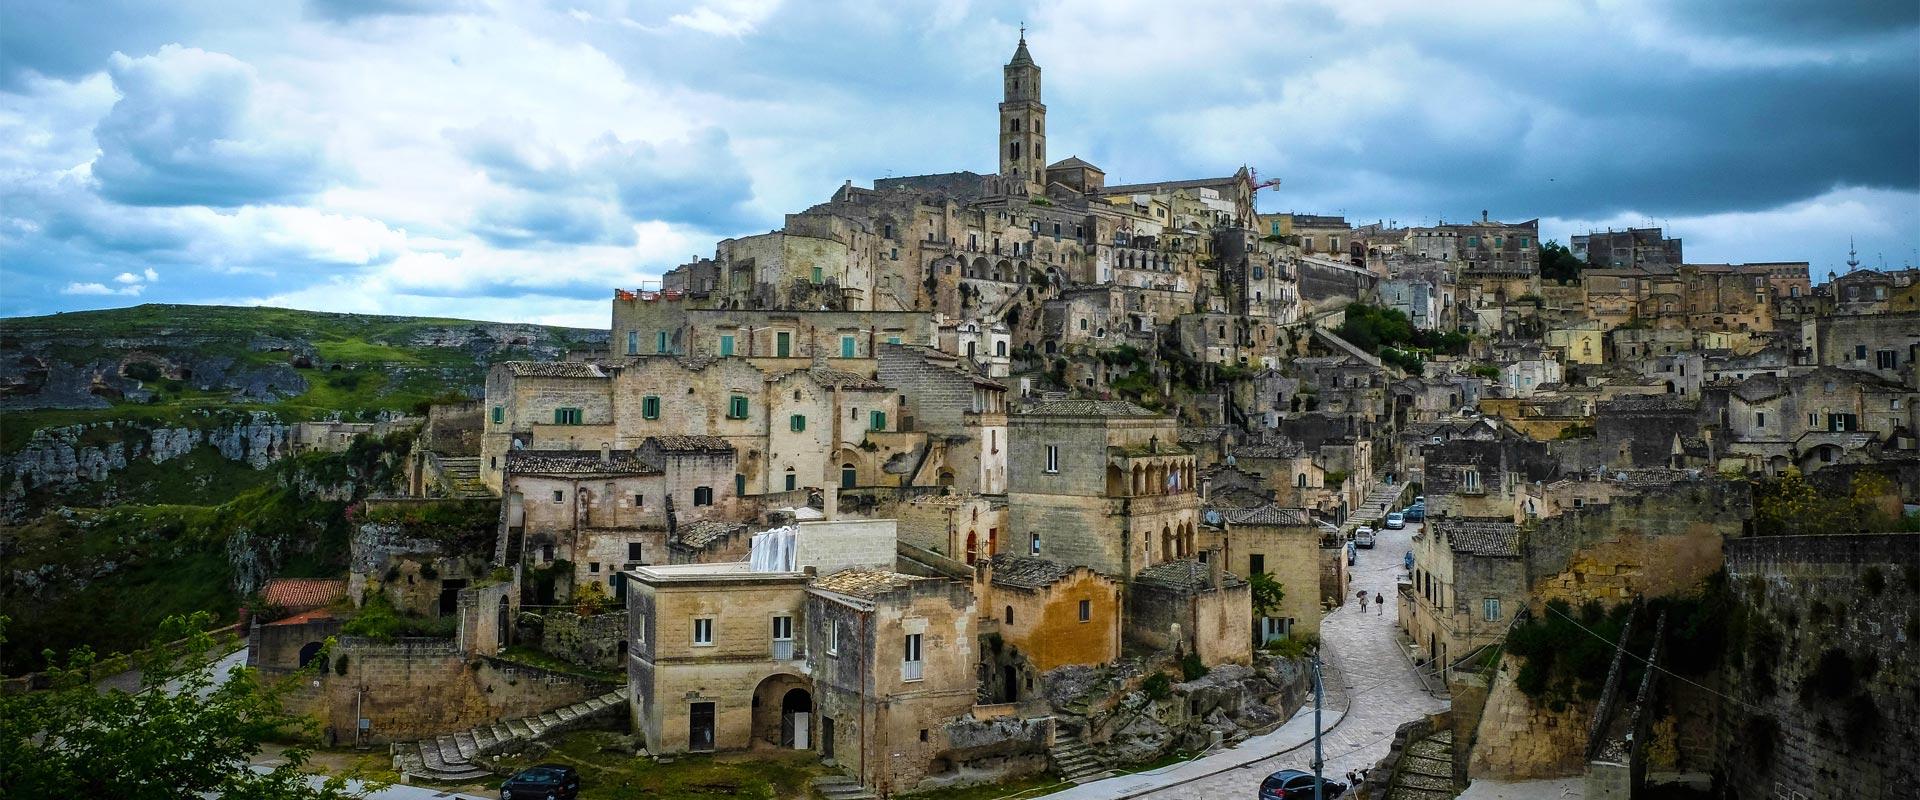 italie-matera-italie-voyage-europe-via-nostra